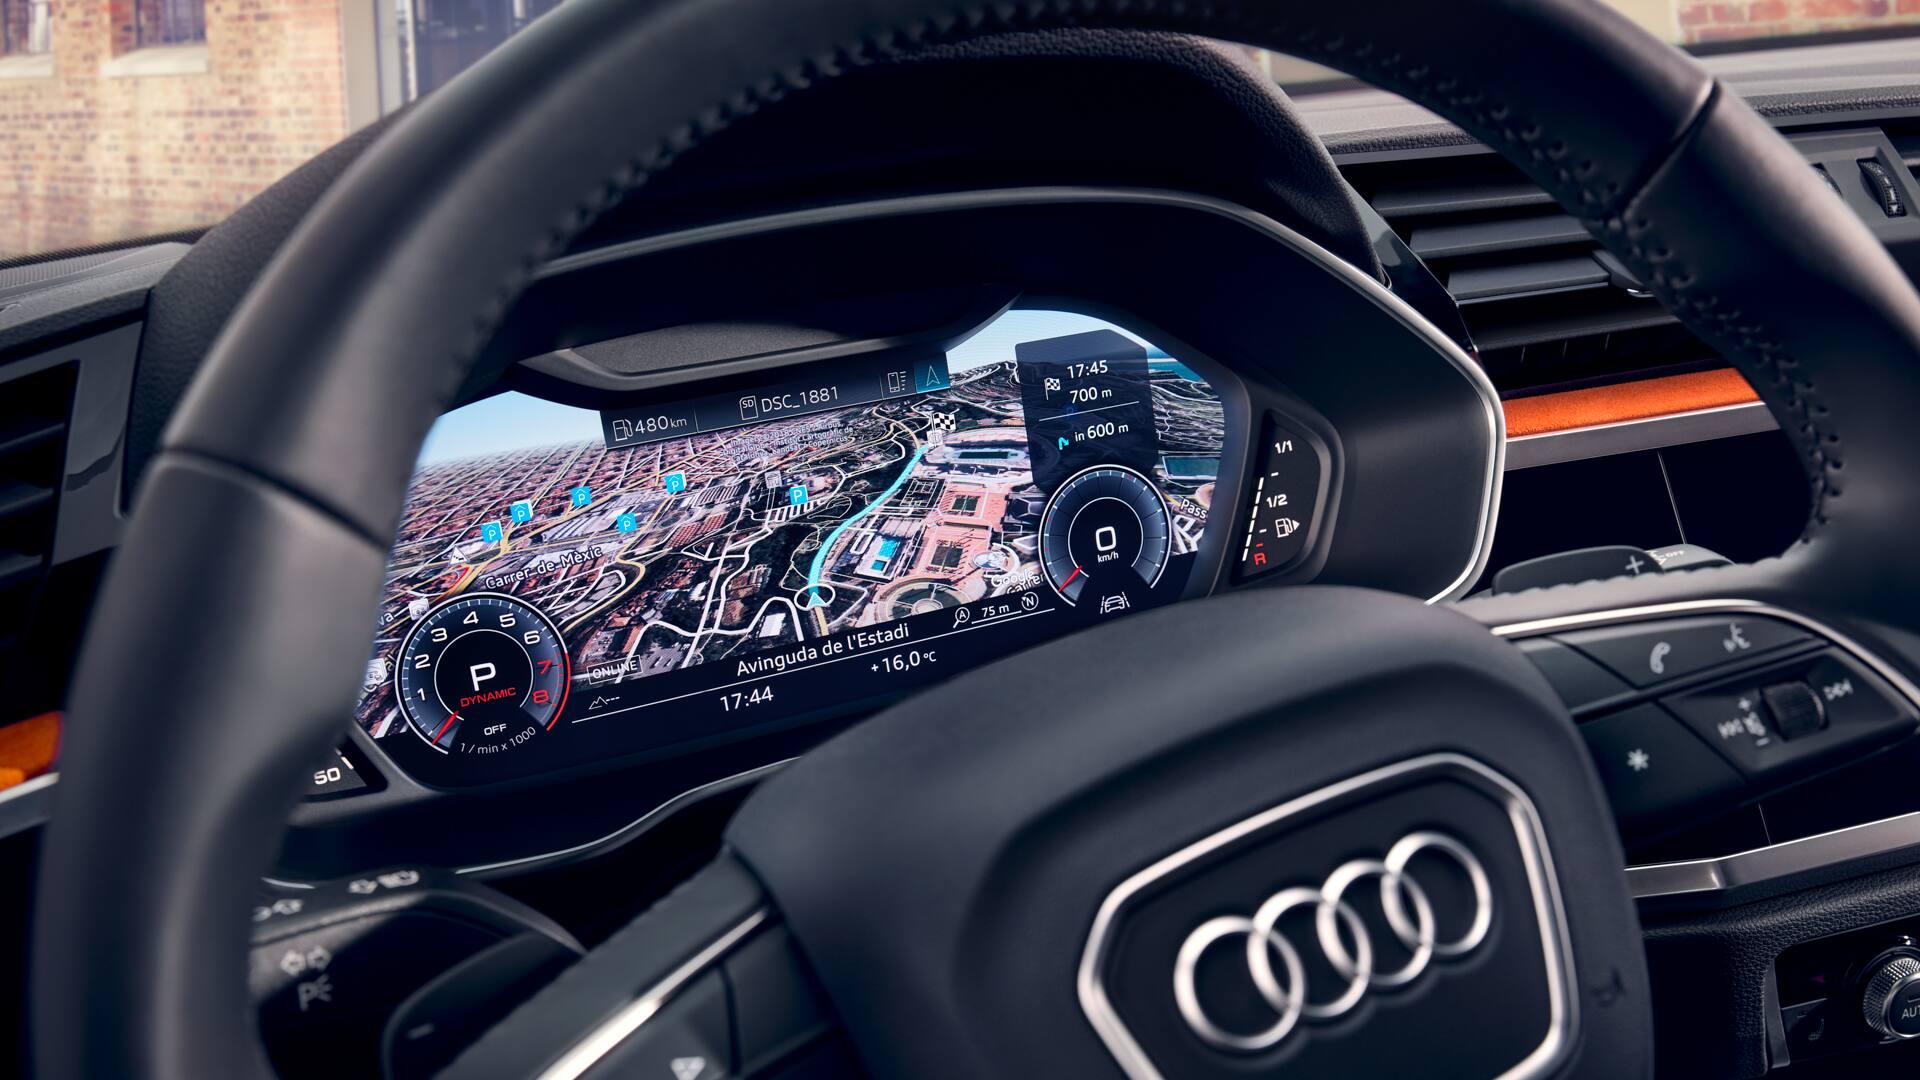 Audi Q3 Q3 Audi